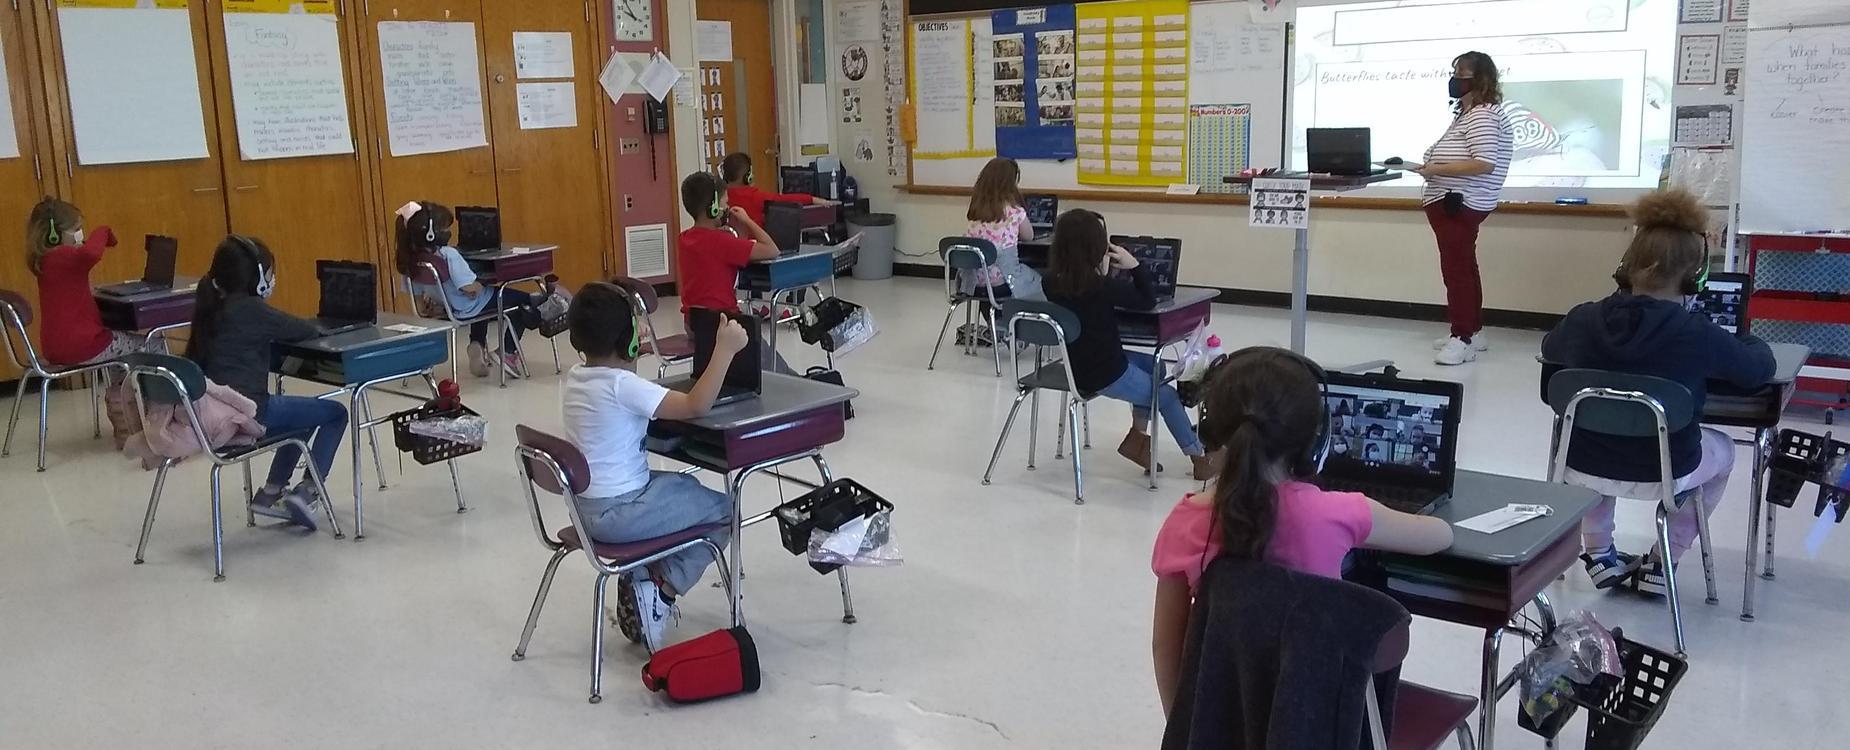 West Street Elementary School classroom